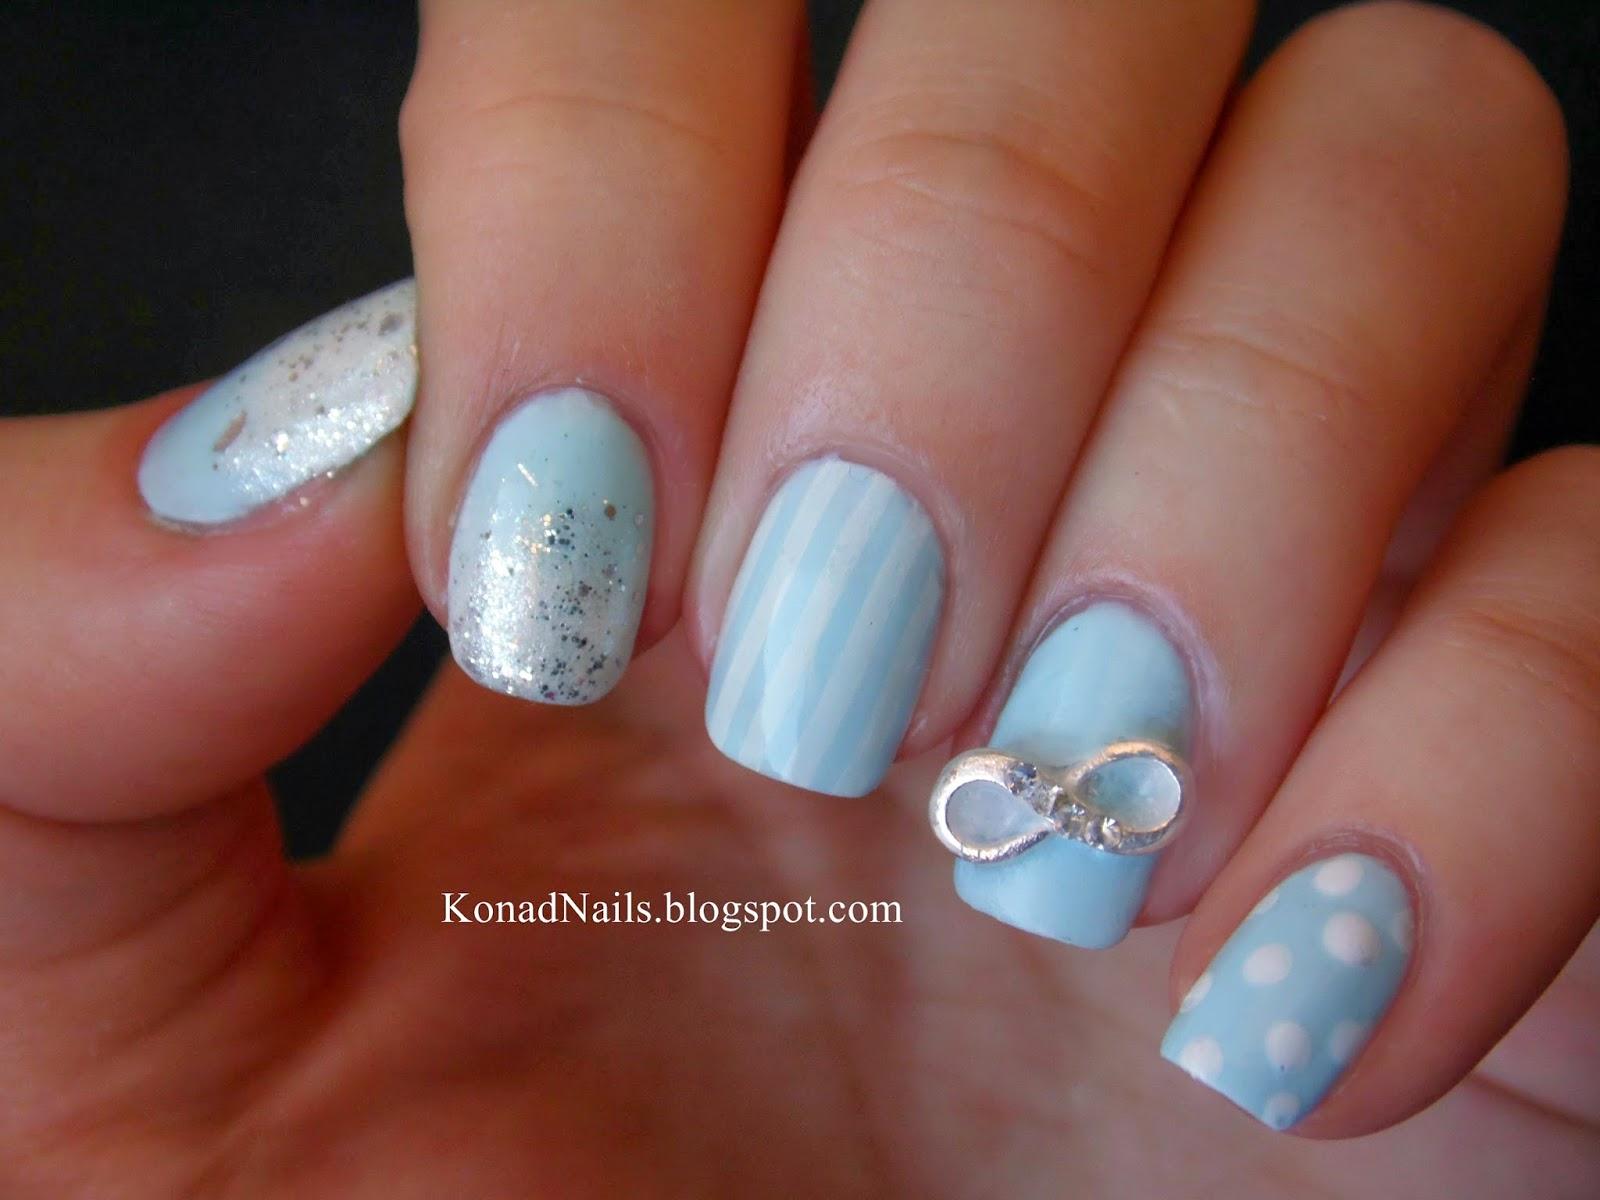 Konad Addict: Infinity nails